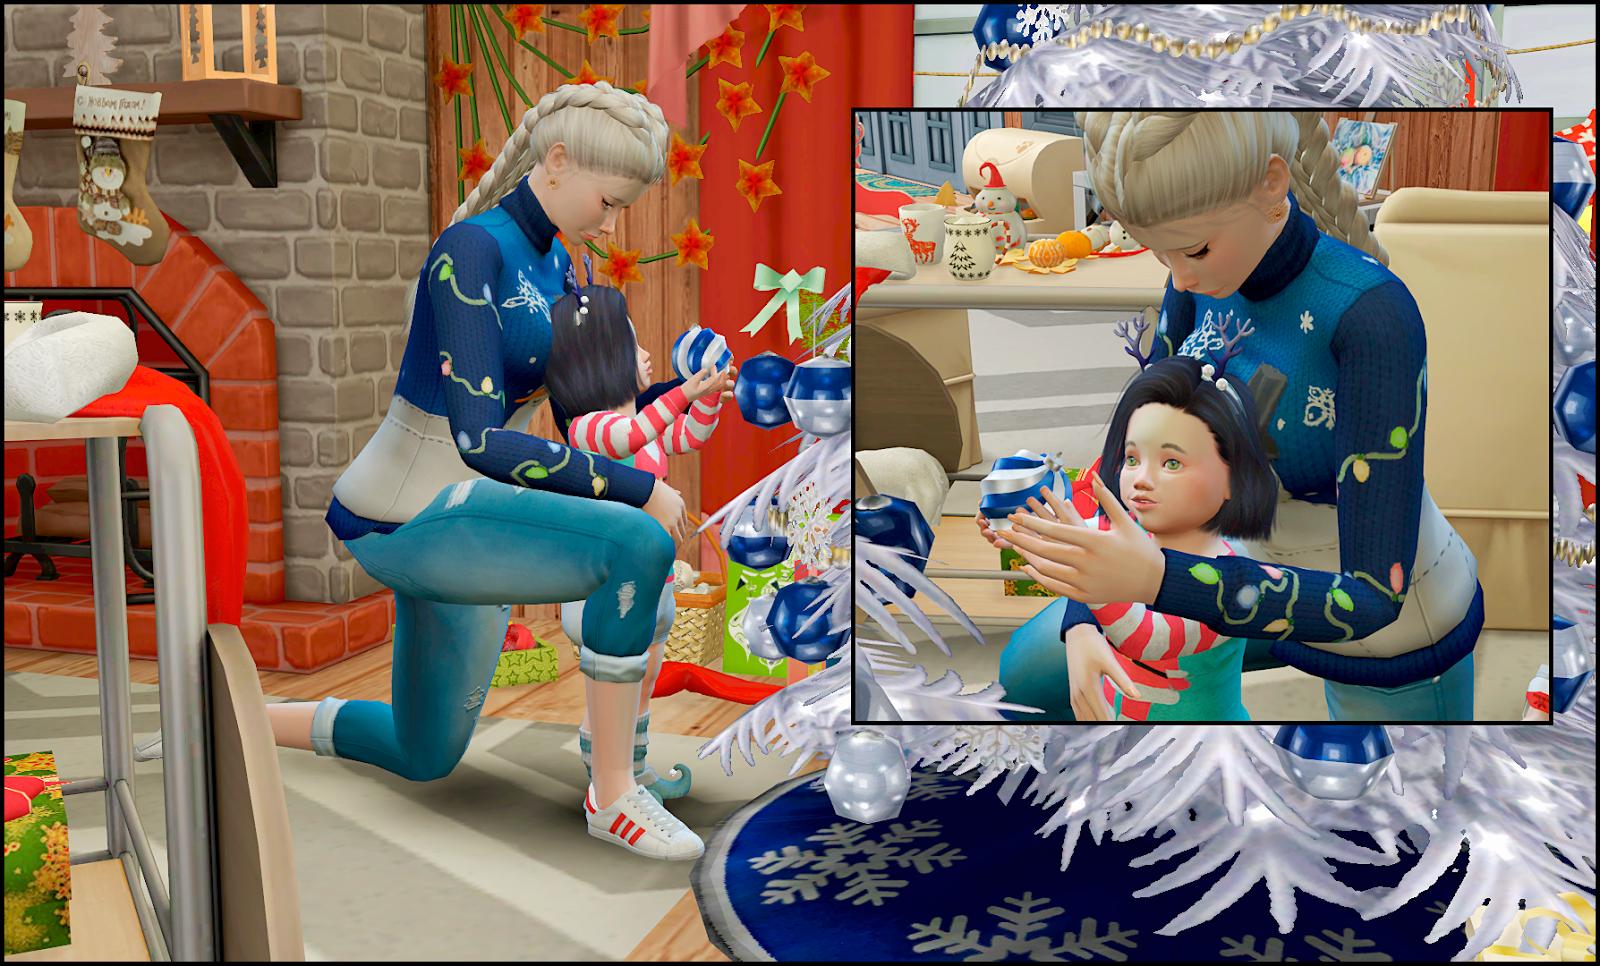 Sims 4 Christmas Poses.Christmas Poses The Sims 4 P1 Sims4 Clove Share Asia